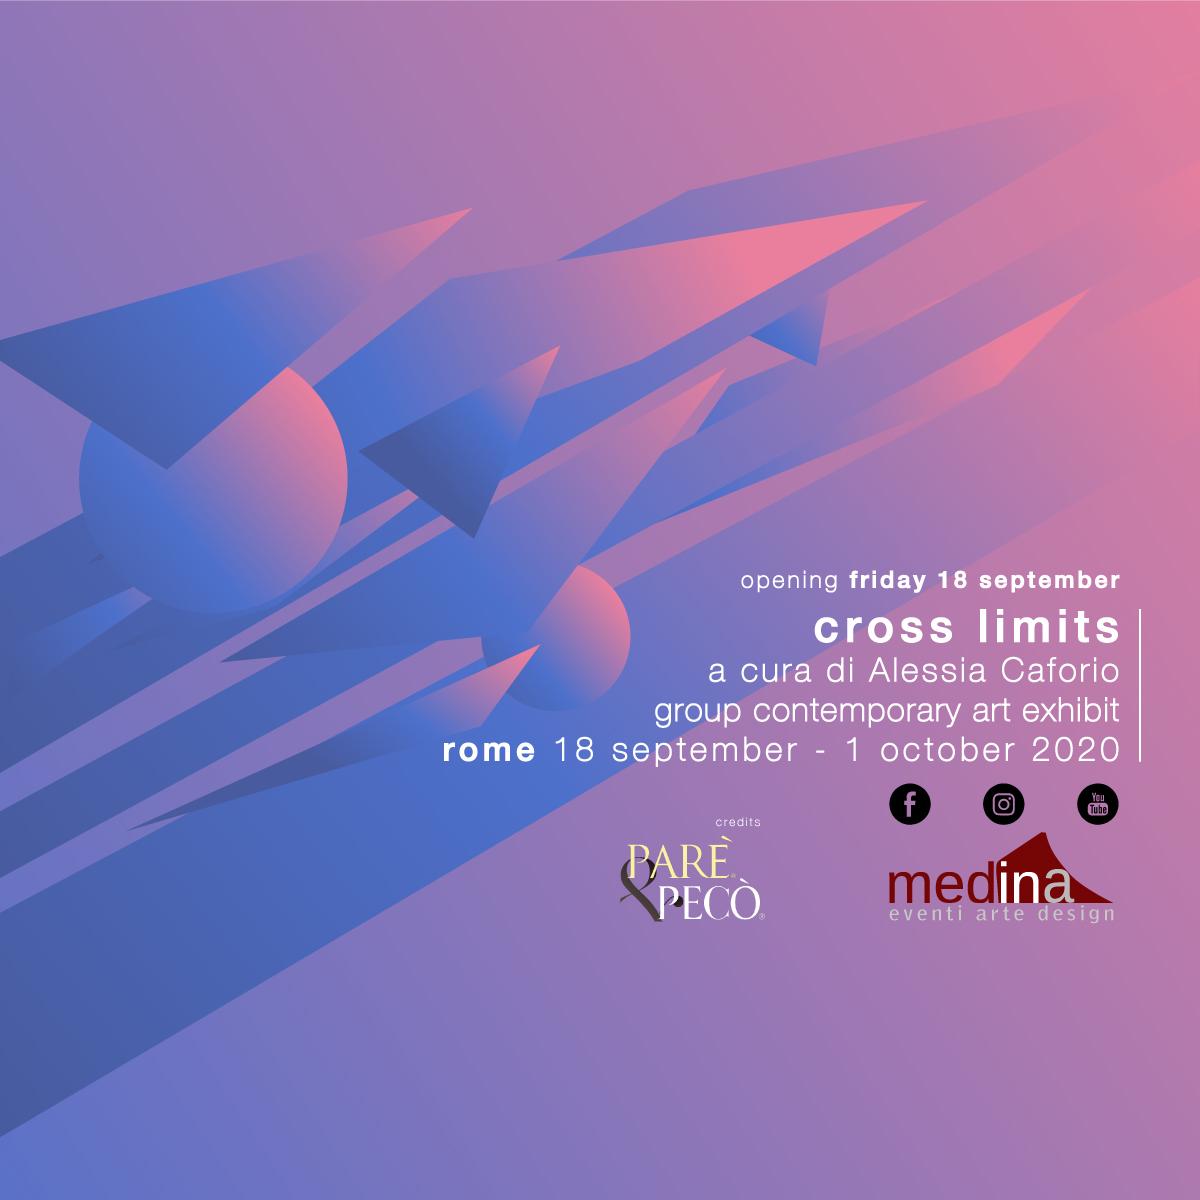 Cross Limits Contemporary Art Exhibit